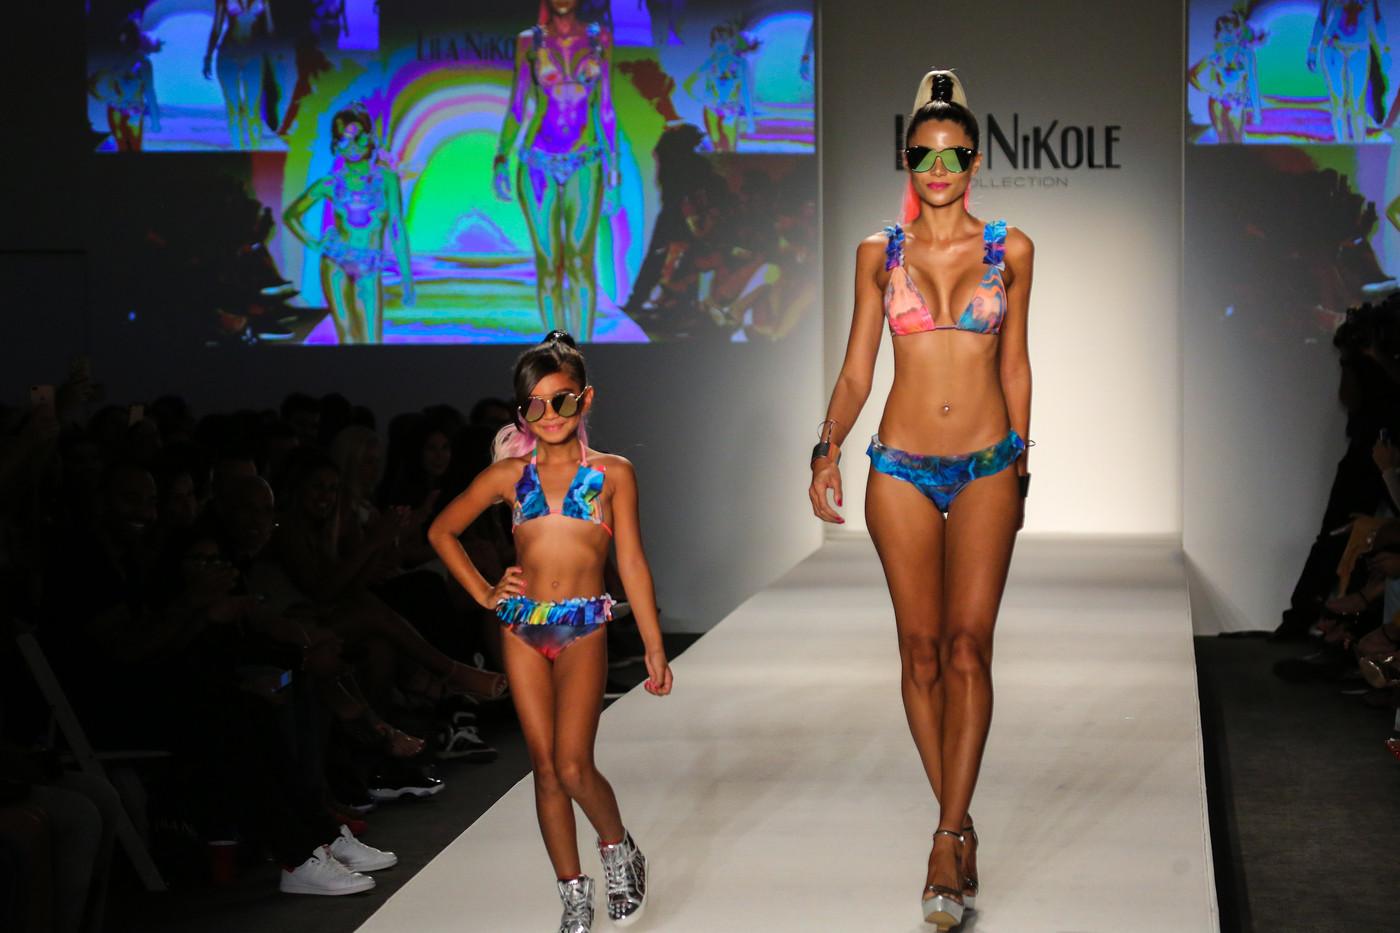 Lila_Nikole_MiamiSwim_SS18_250-vi.jpg